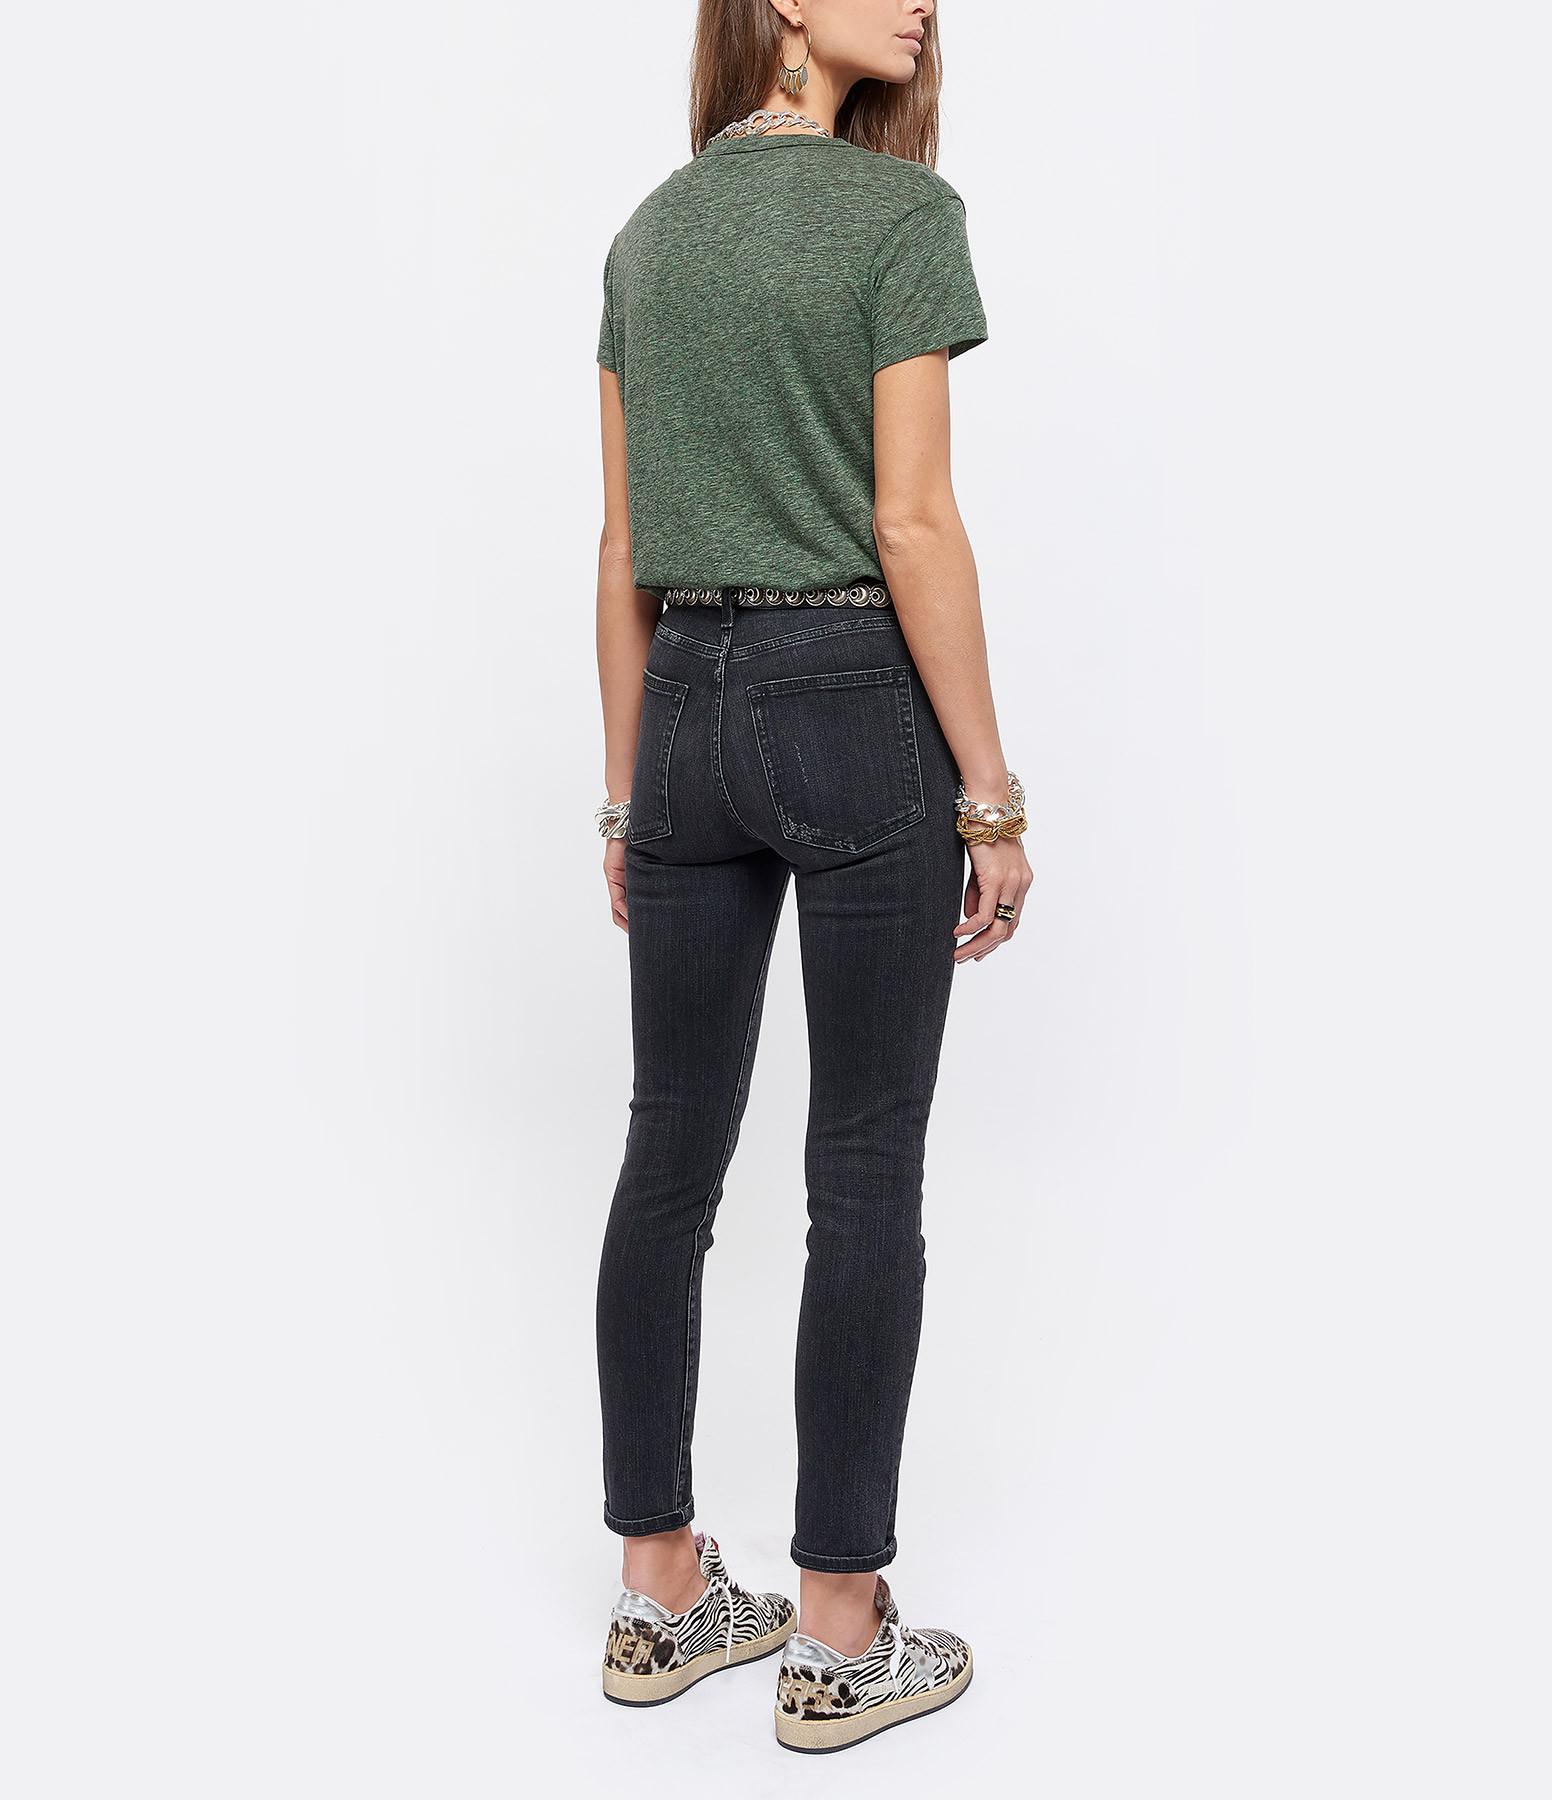 ZADIG & VOLTAIRE - Tee-shirt Walk Amour Coton Amande